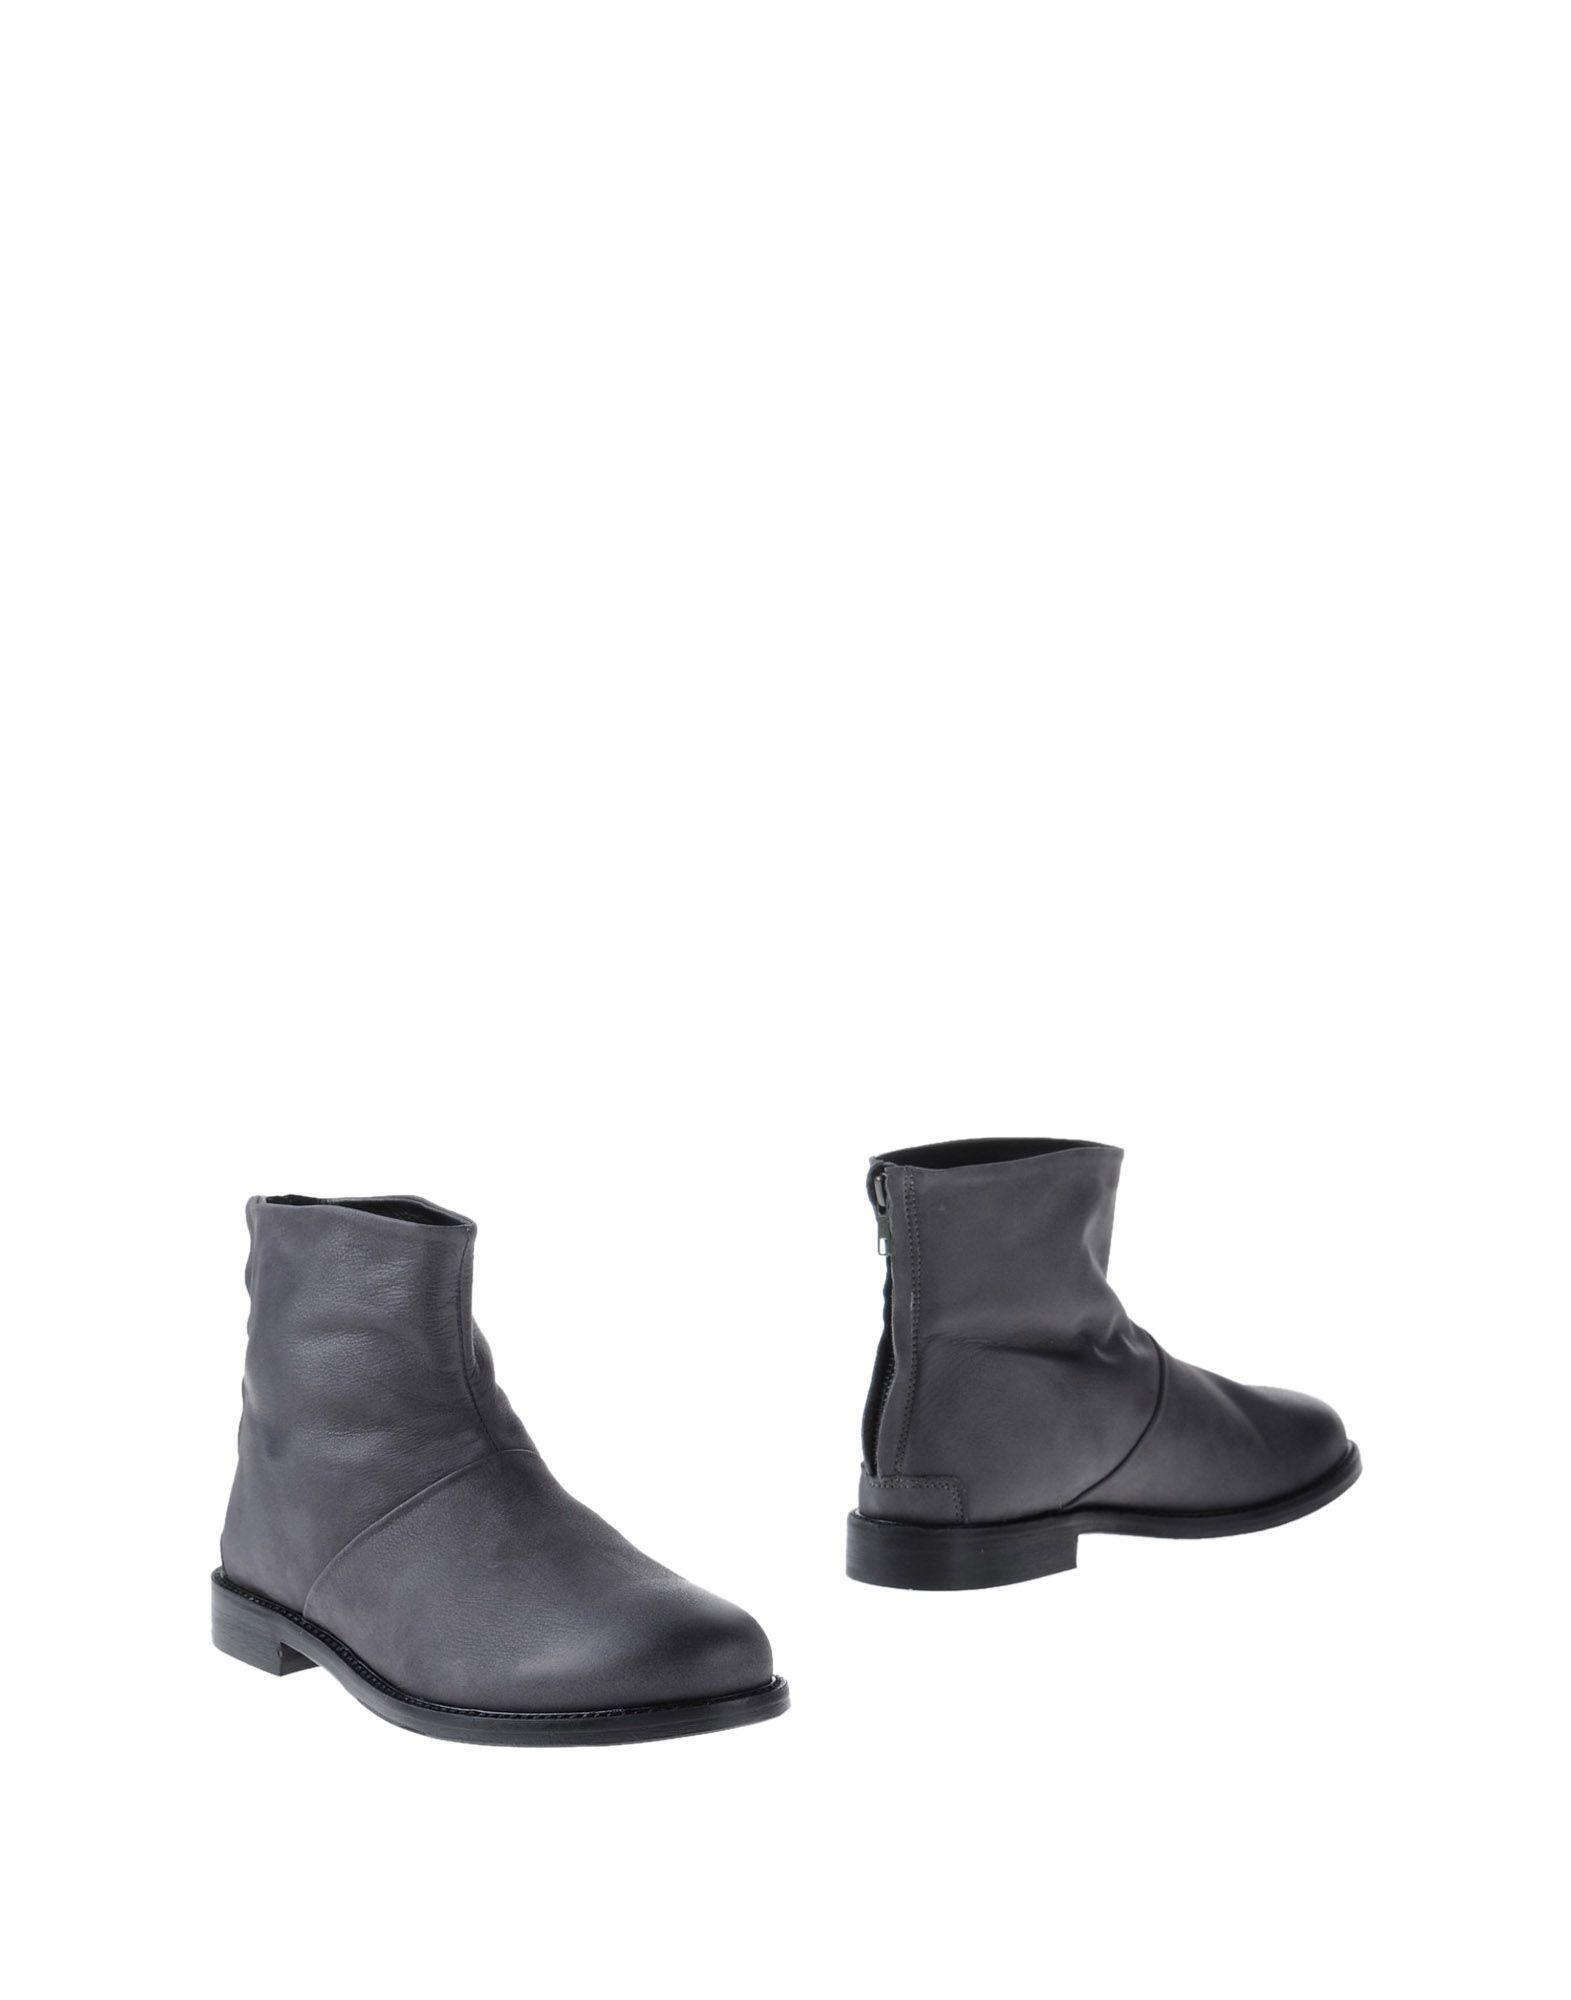 Stilvolle billige Schuhe Shoe Bar Bar Bar Stiefelette Damen  11023458II fac54f